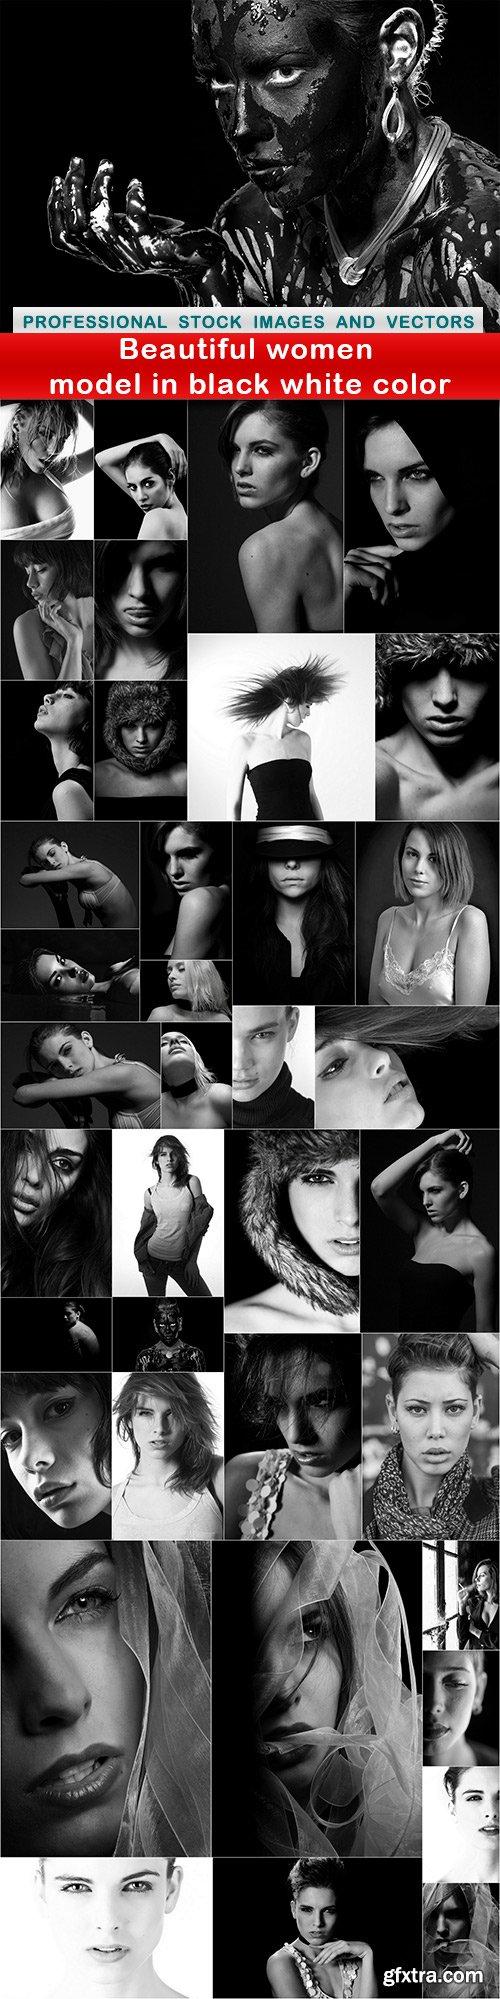 Beautiful women model in black white color - 39 UHQ JPEG